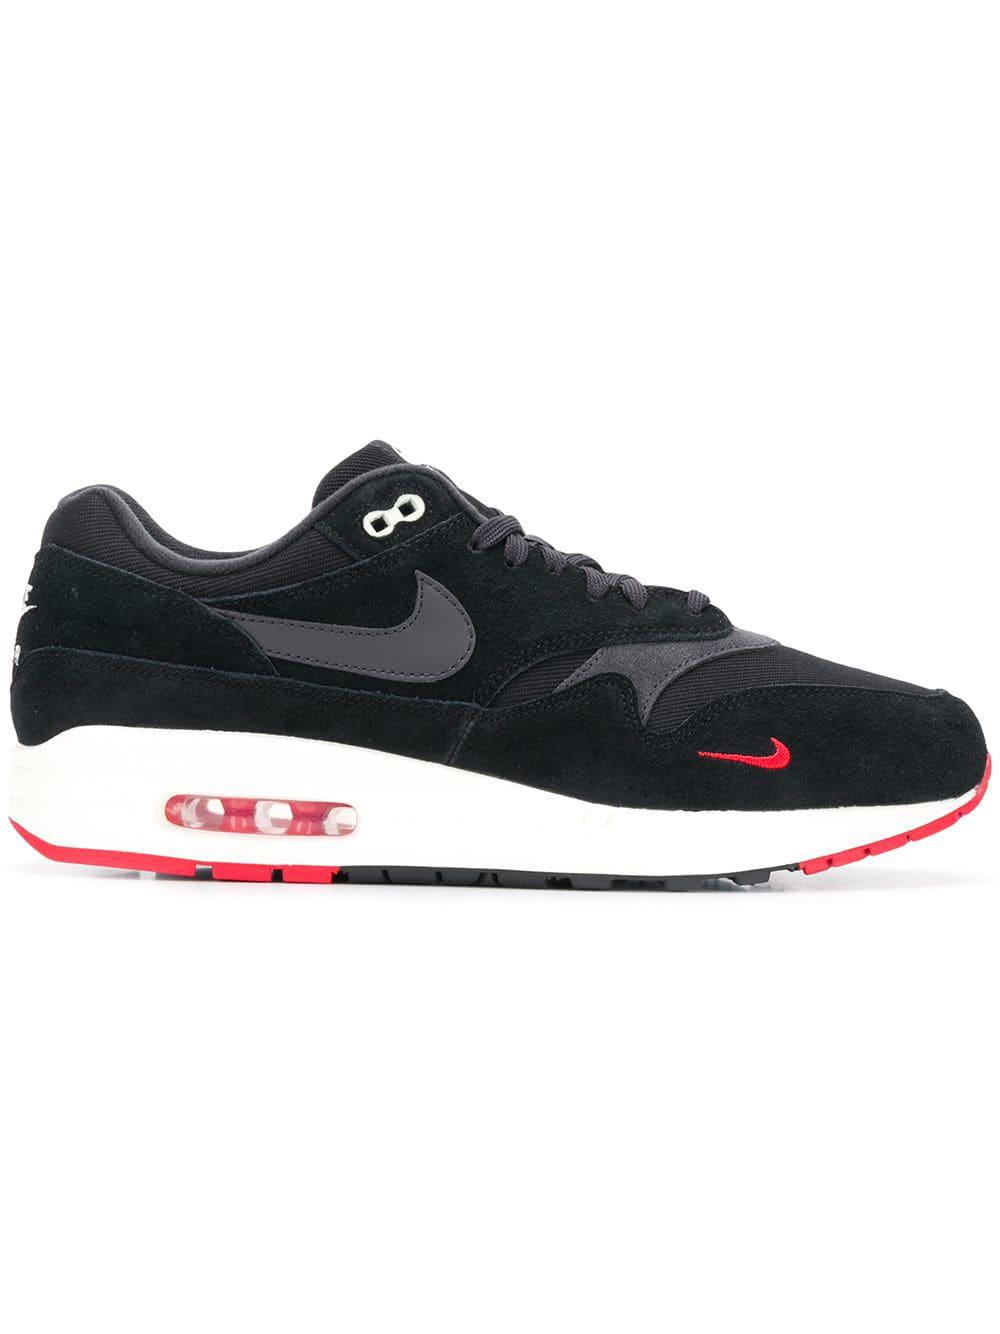 Lyst Nike Air Max 1 Premium Scarpe da Uomo Ginnastica in Nero for Uomo da 29eafd